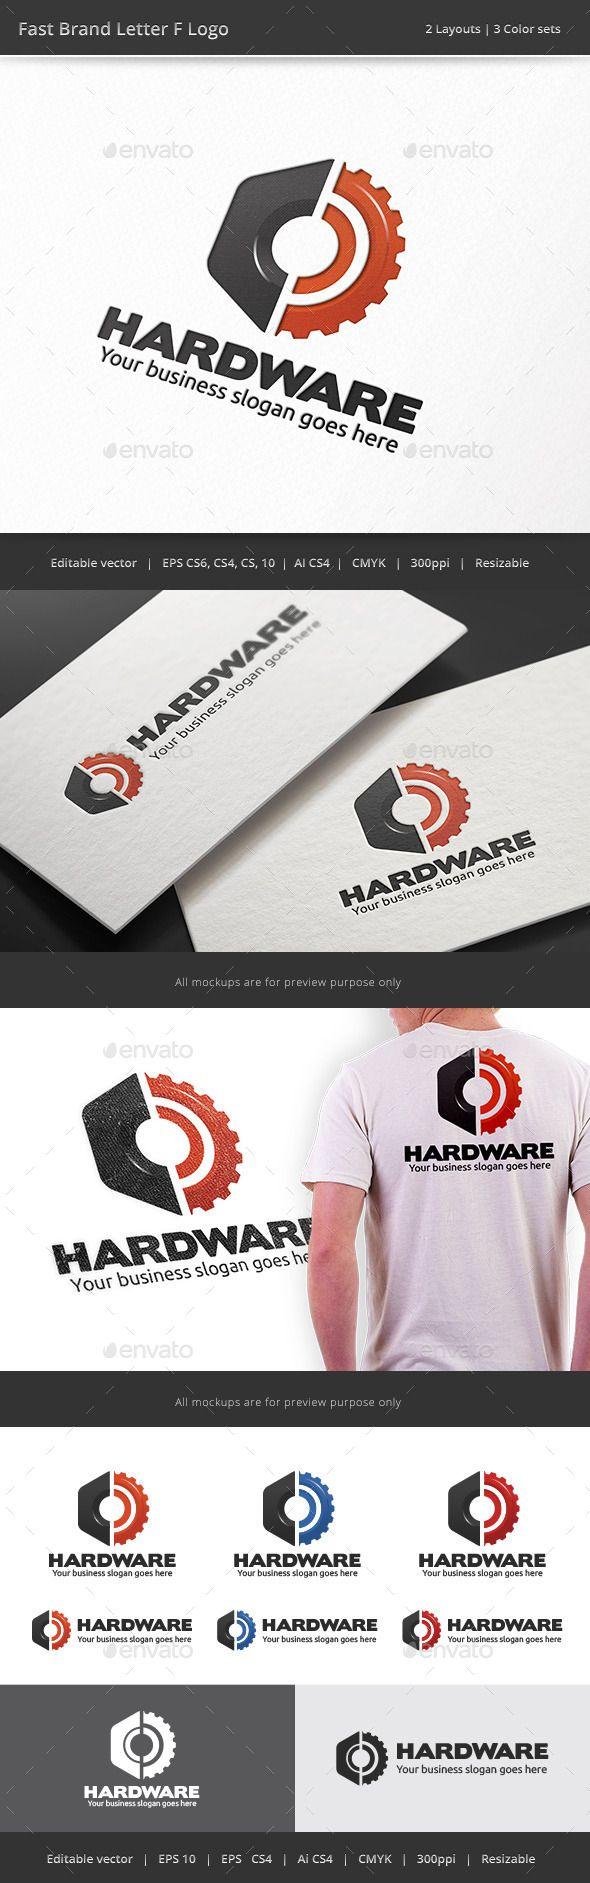 Shirt design program for mac - Hardware Gear Logo